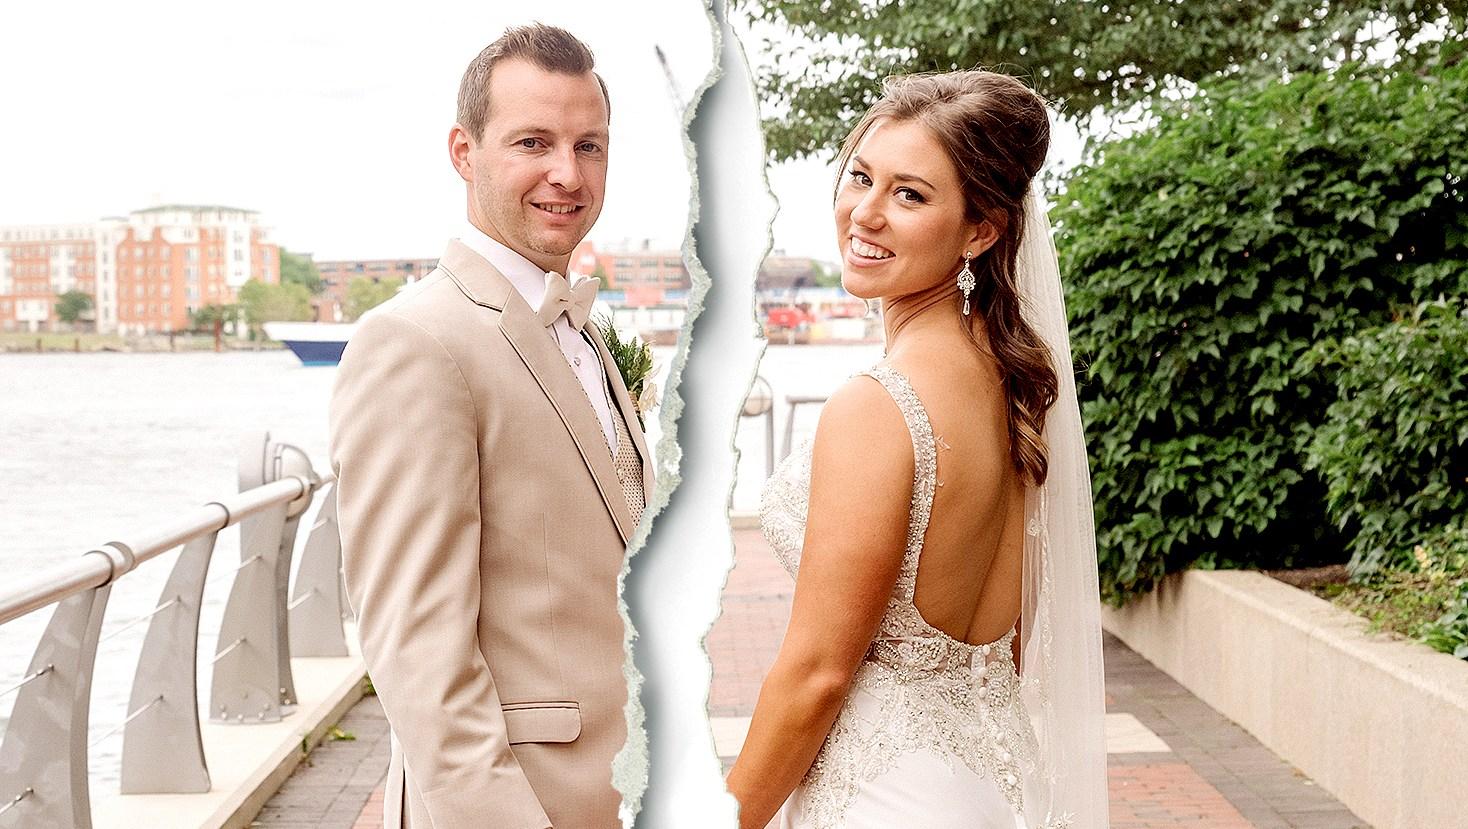 Jaclyn-Schwartzberg-and-Ryan-Buckley-split